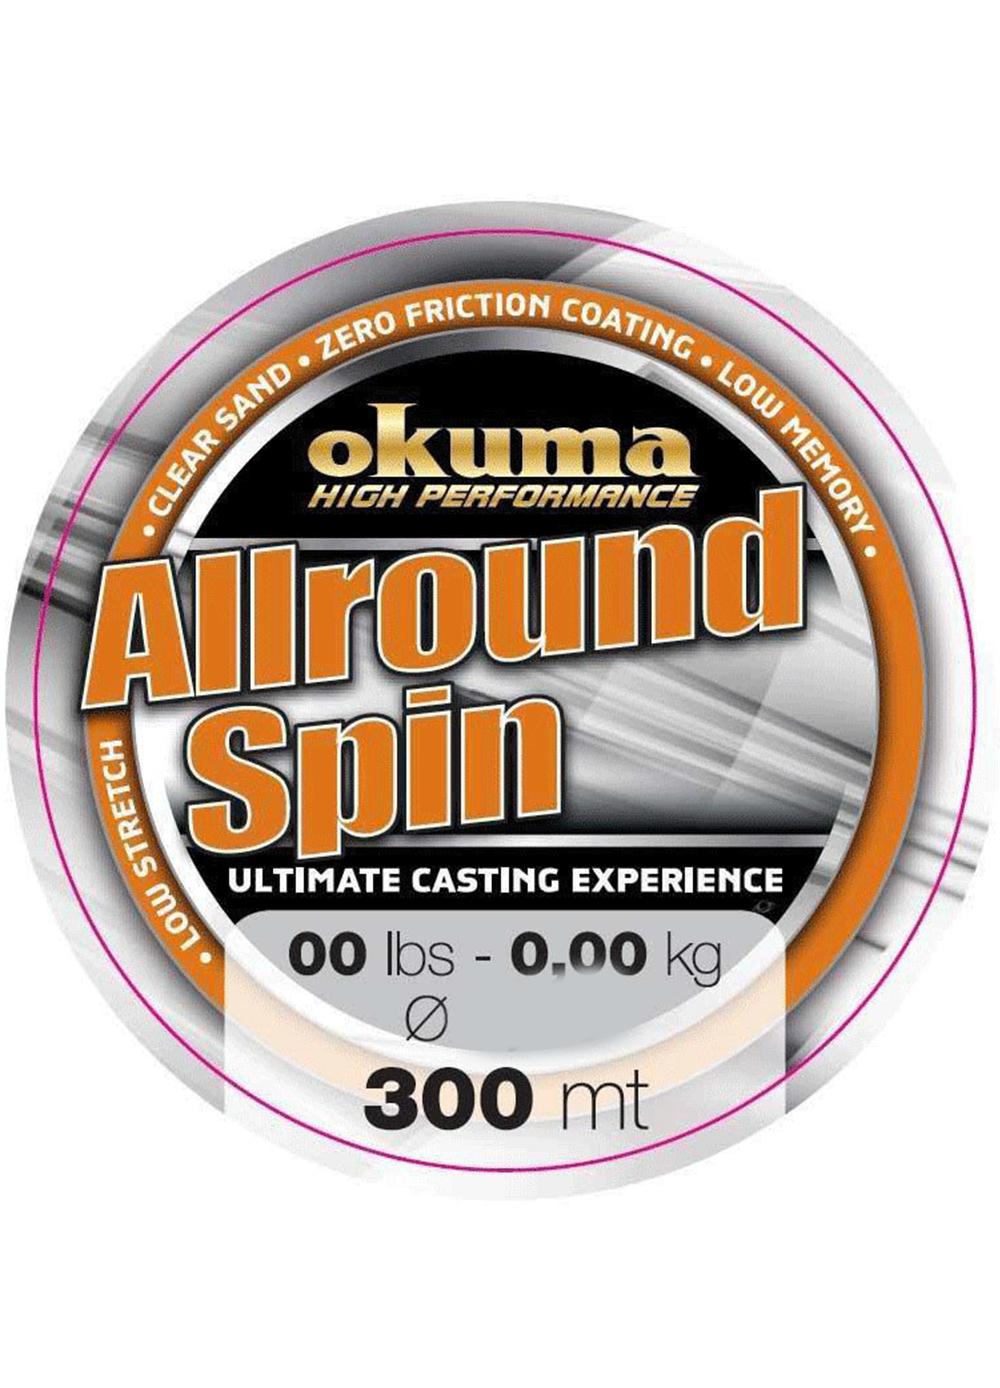 Okuma - Okuma Allround Spin 300mt Brown Misina